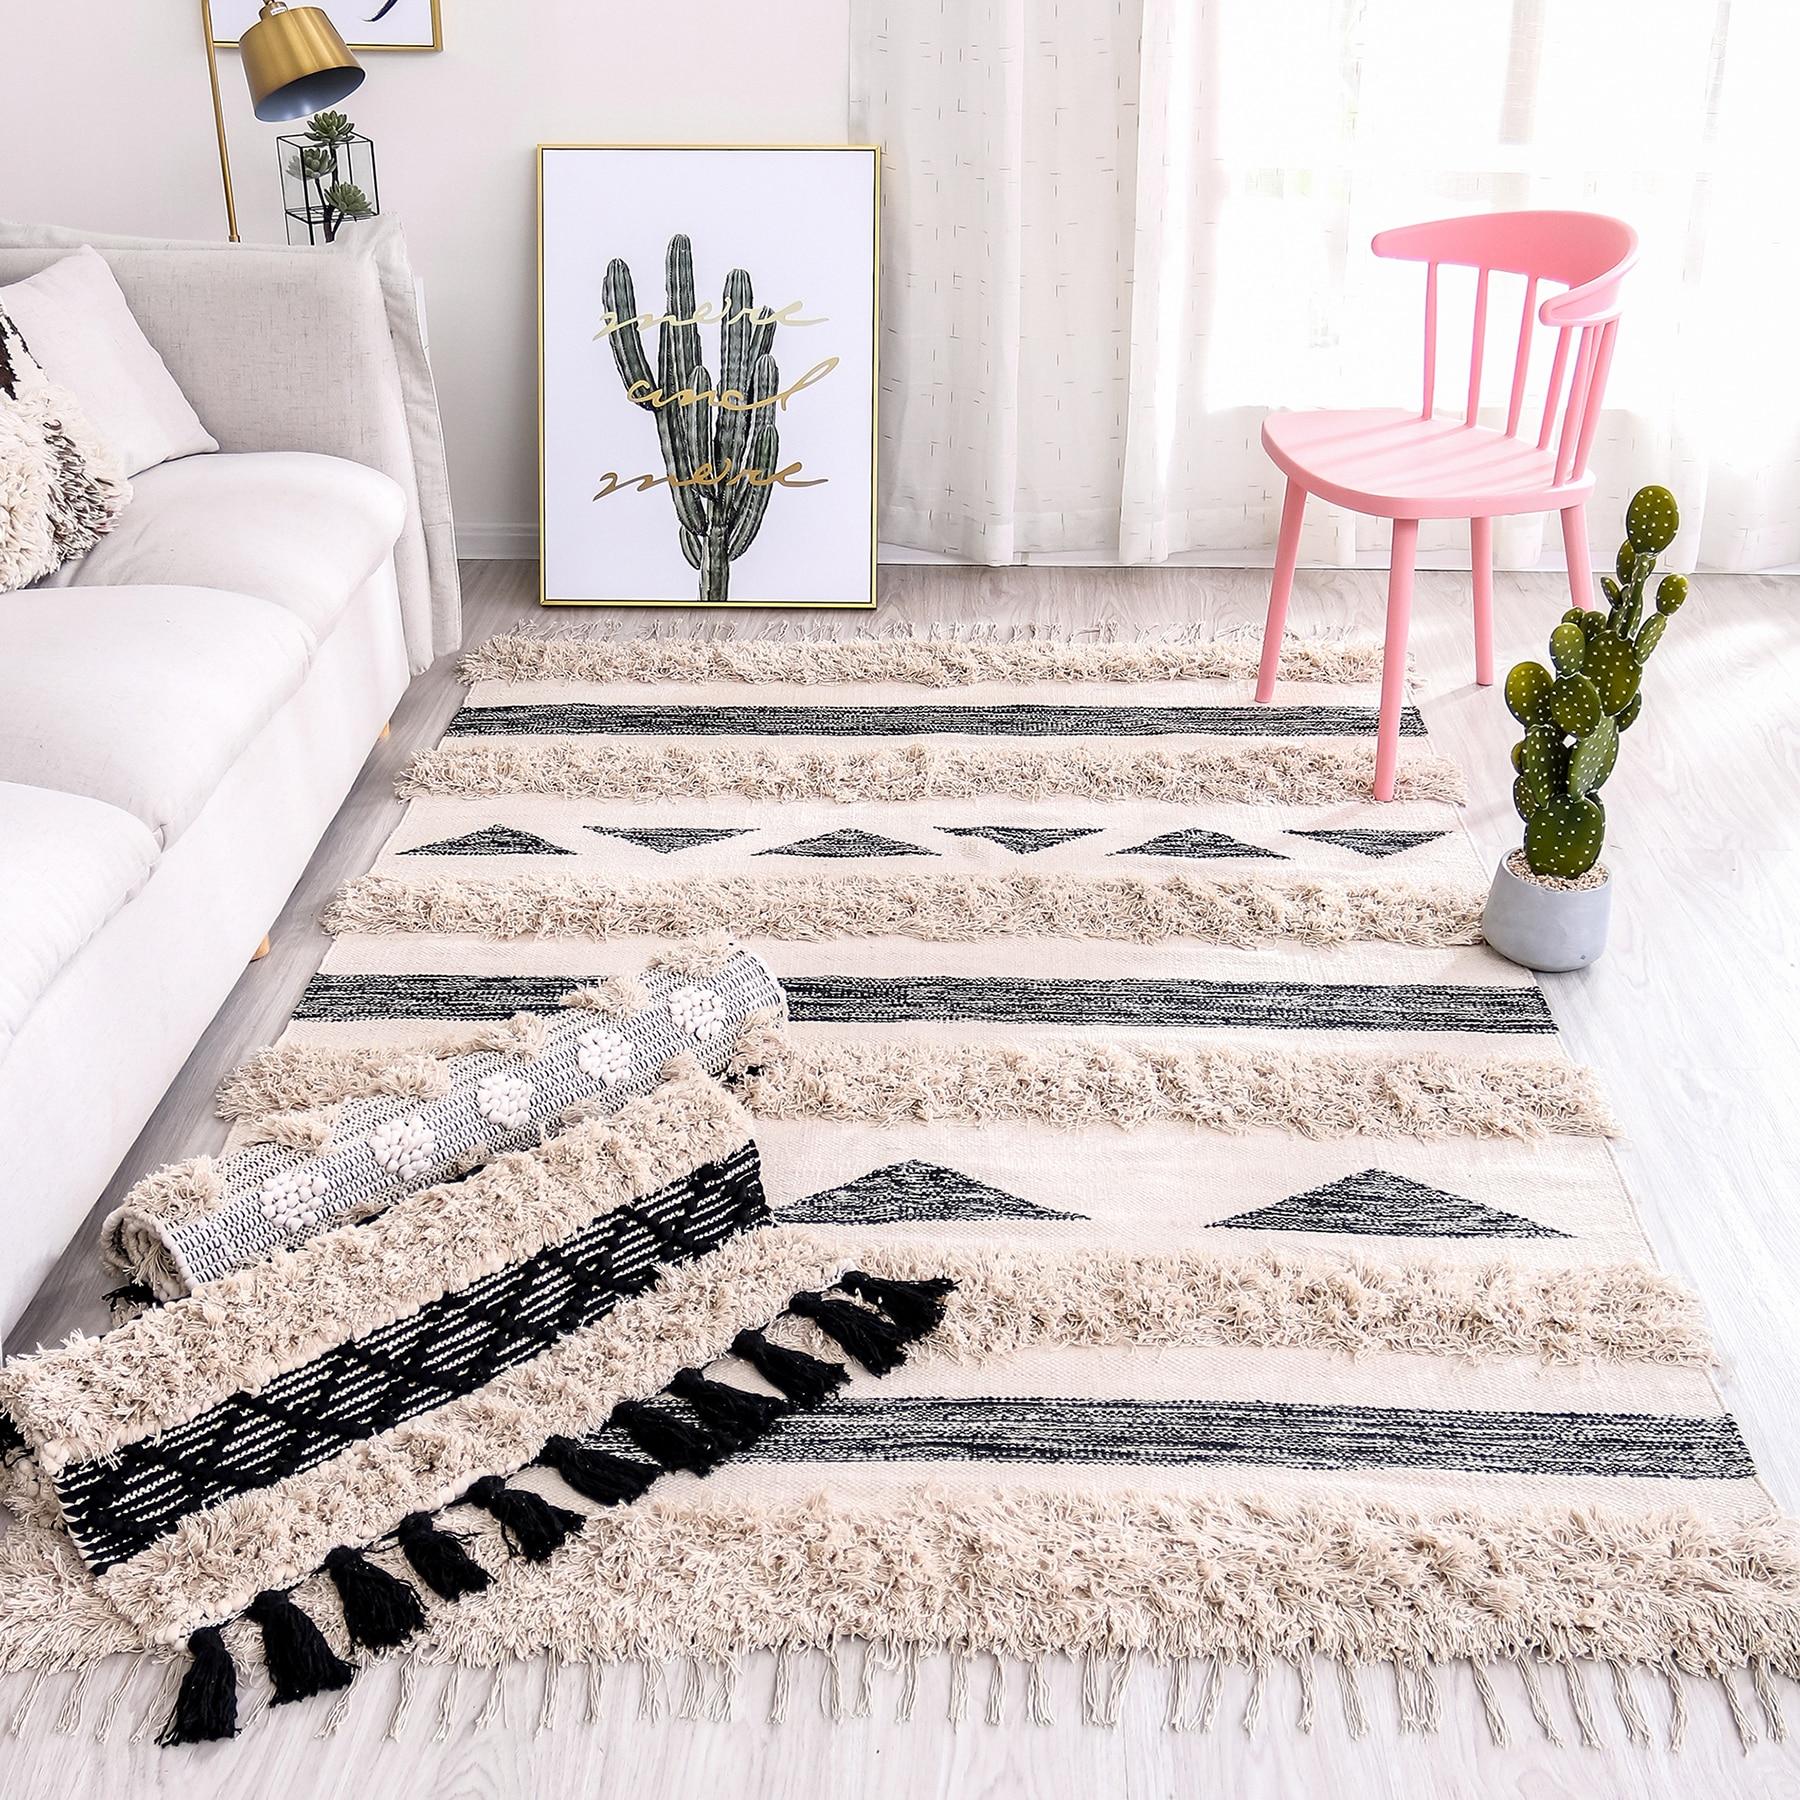 India Hand Woven Cotton Carpets For Living Room Morocco 160x230cm Rugs Bedroom Tassels Bedside Rug Bath Mat Doormat Room Carpet